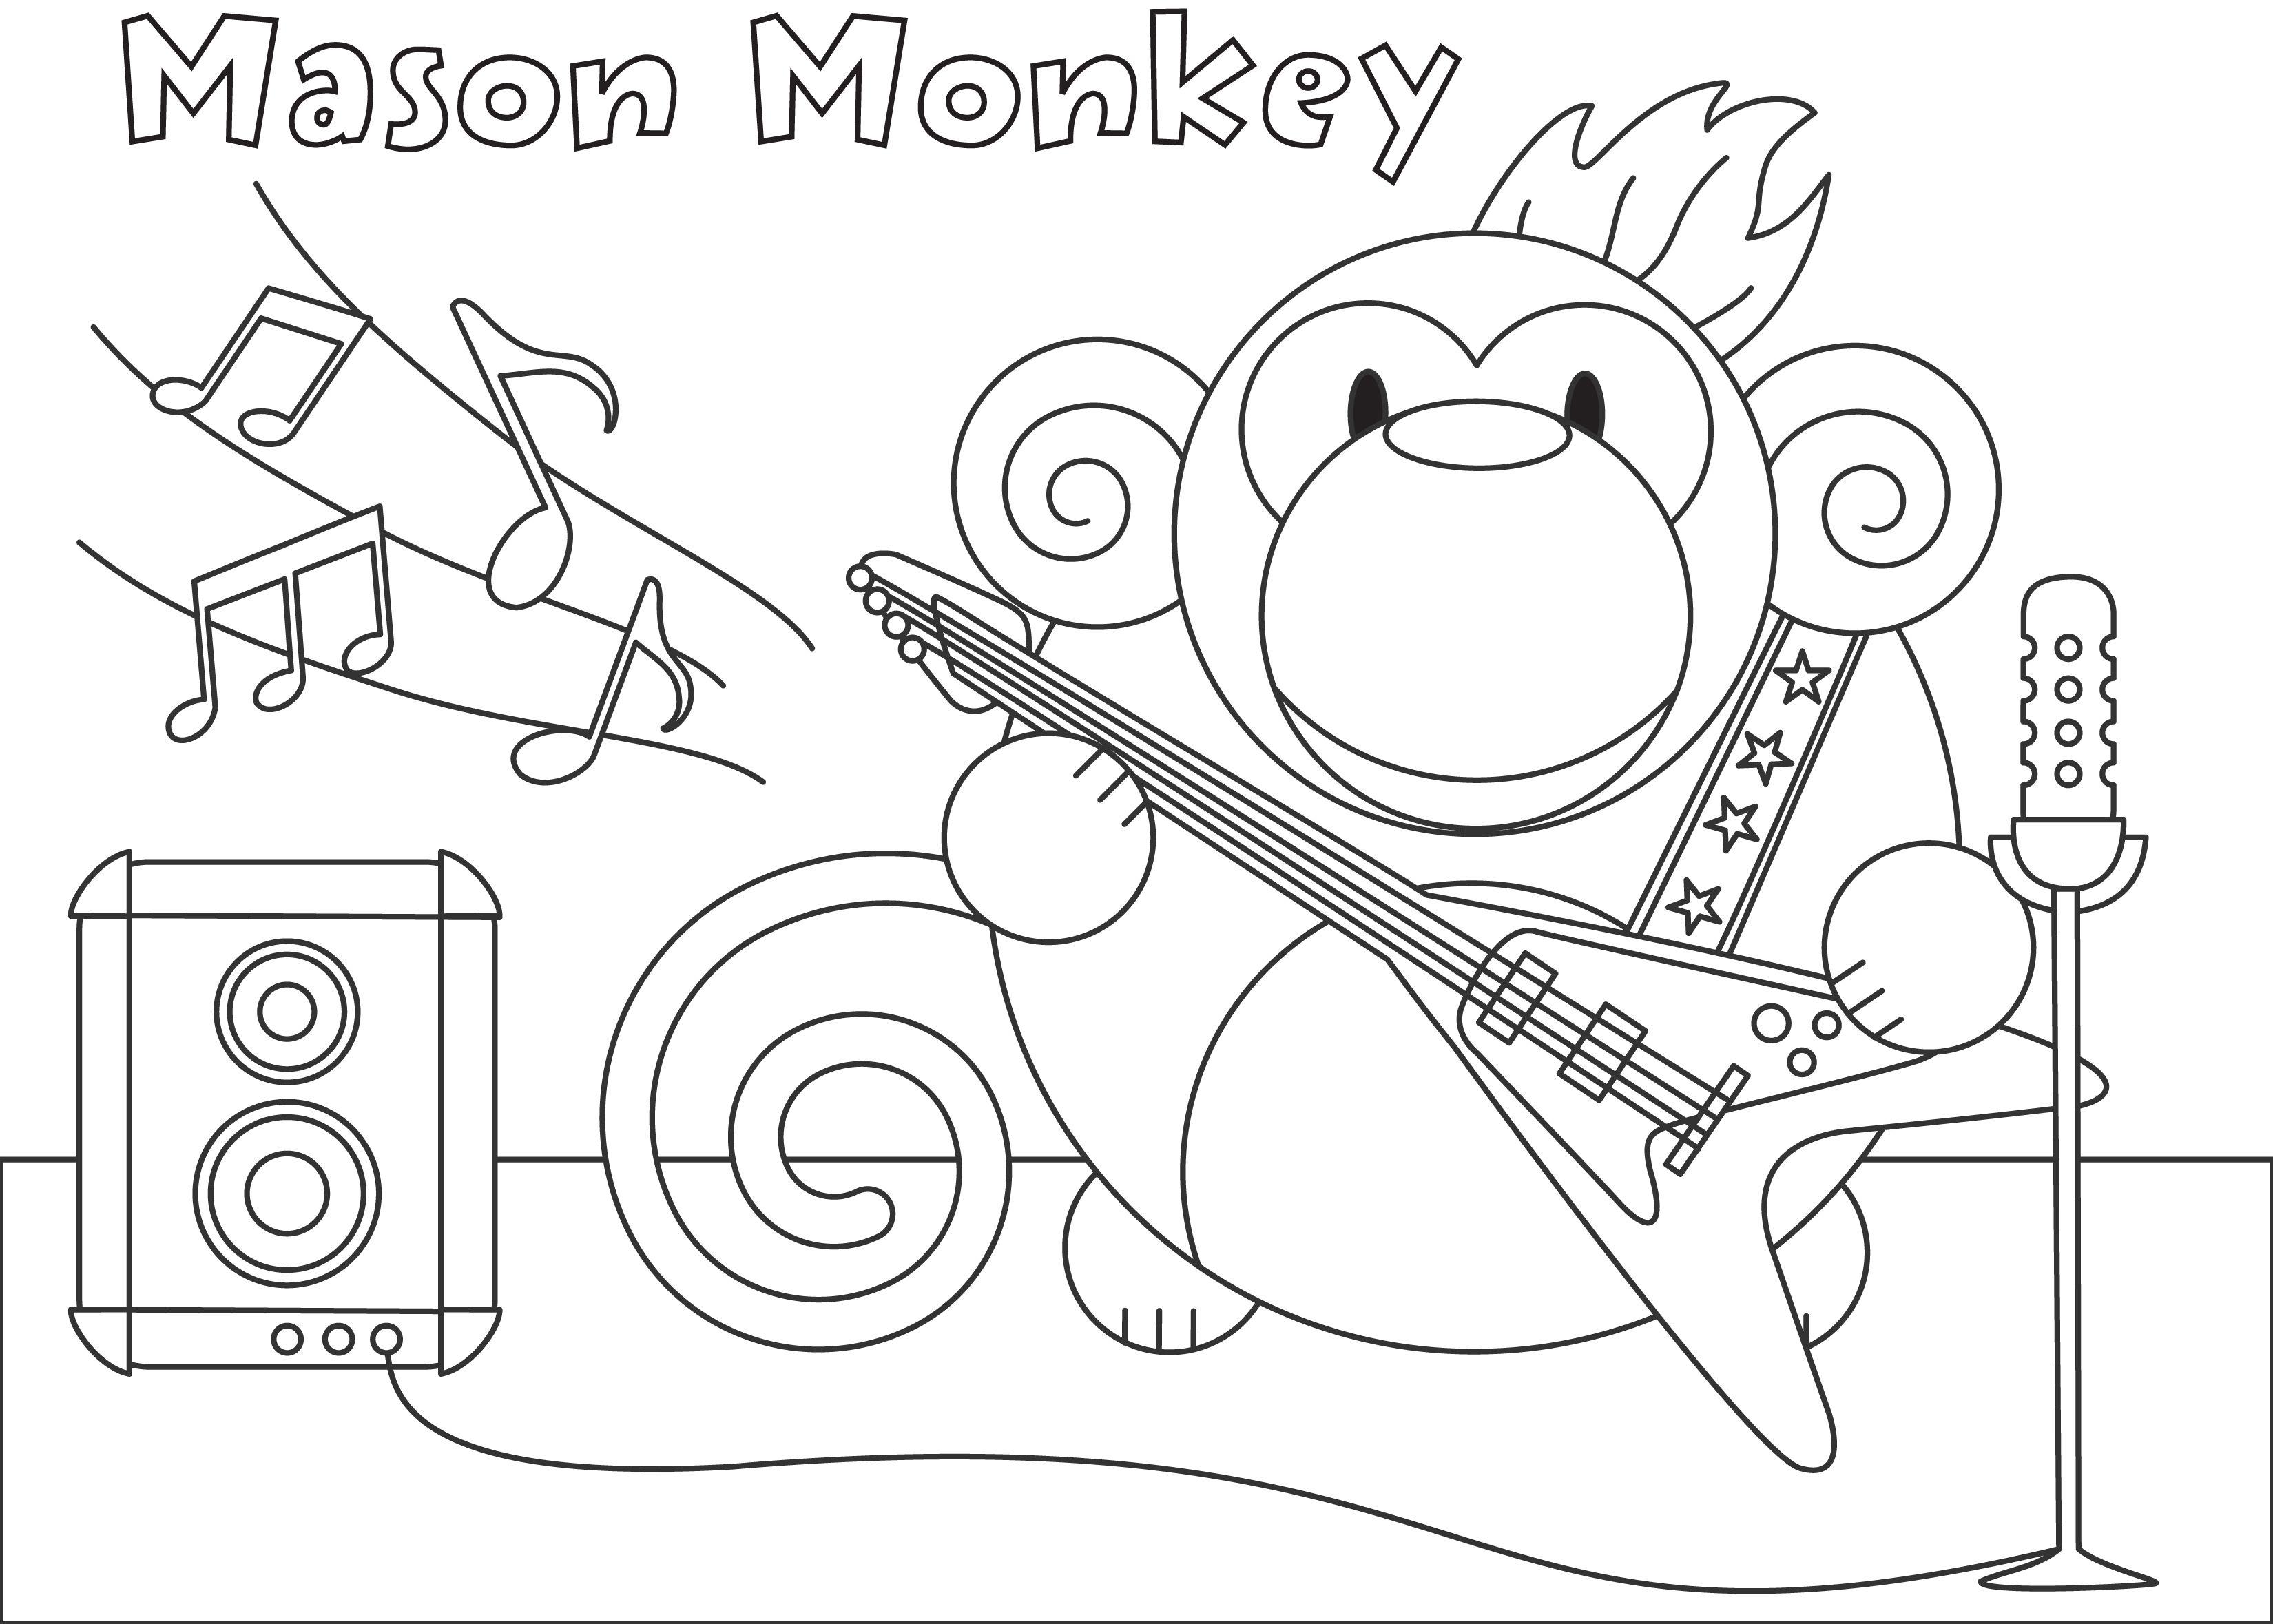 Mason Monkey #bumpidoodle Coloring Page